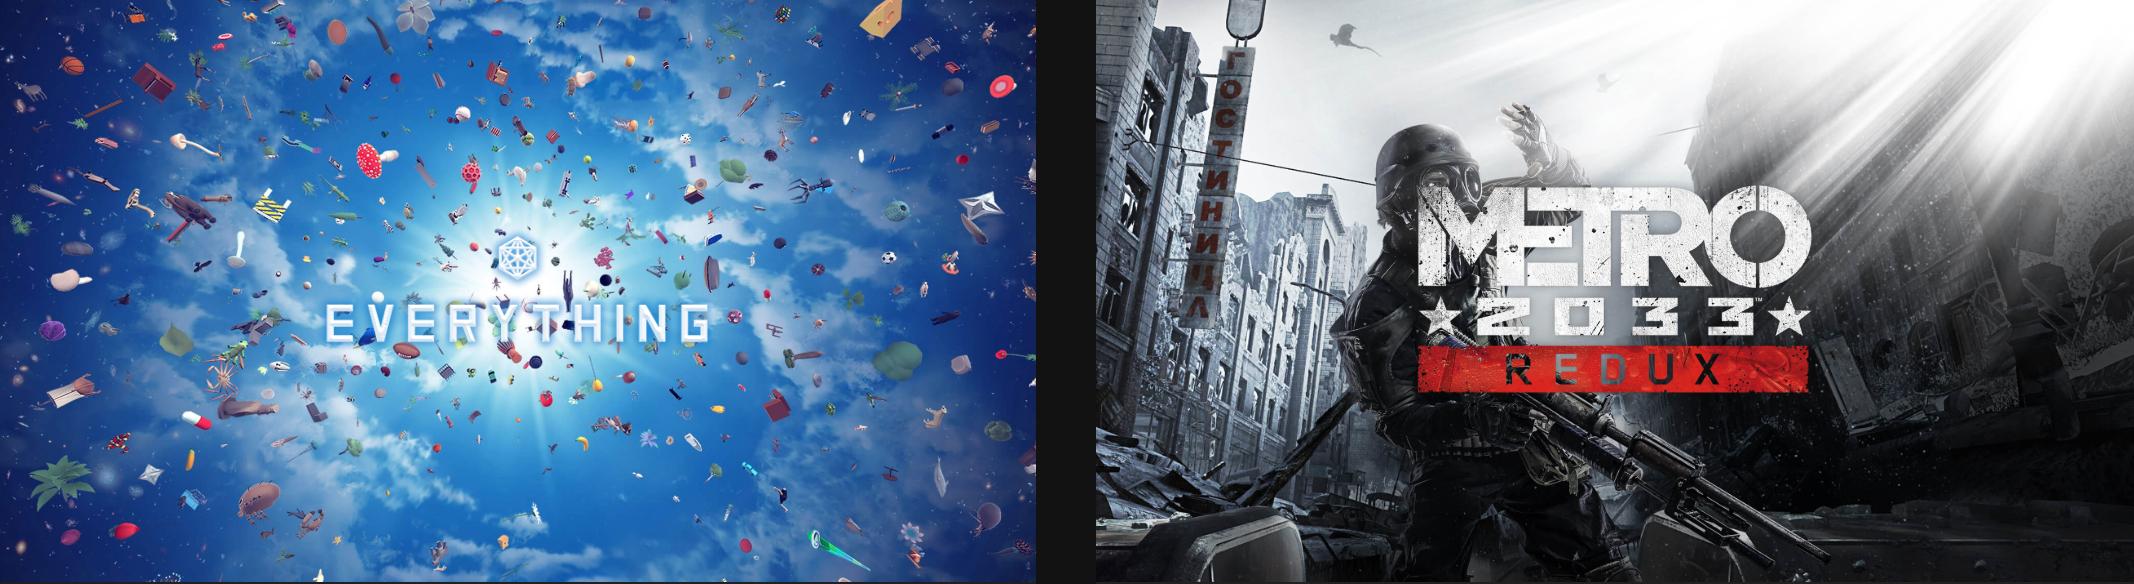 Epicgames Metro 2033 Redux; Everything; Vrij van September 26 - Oktober 03.